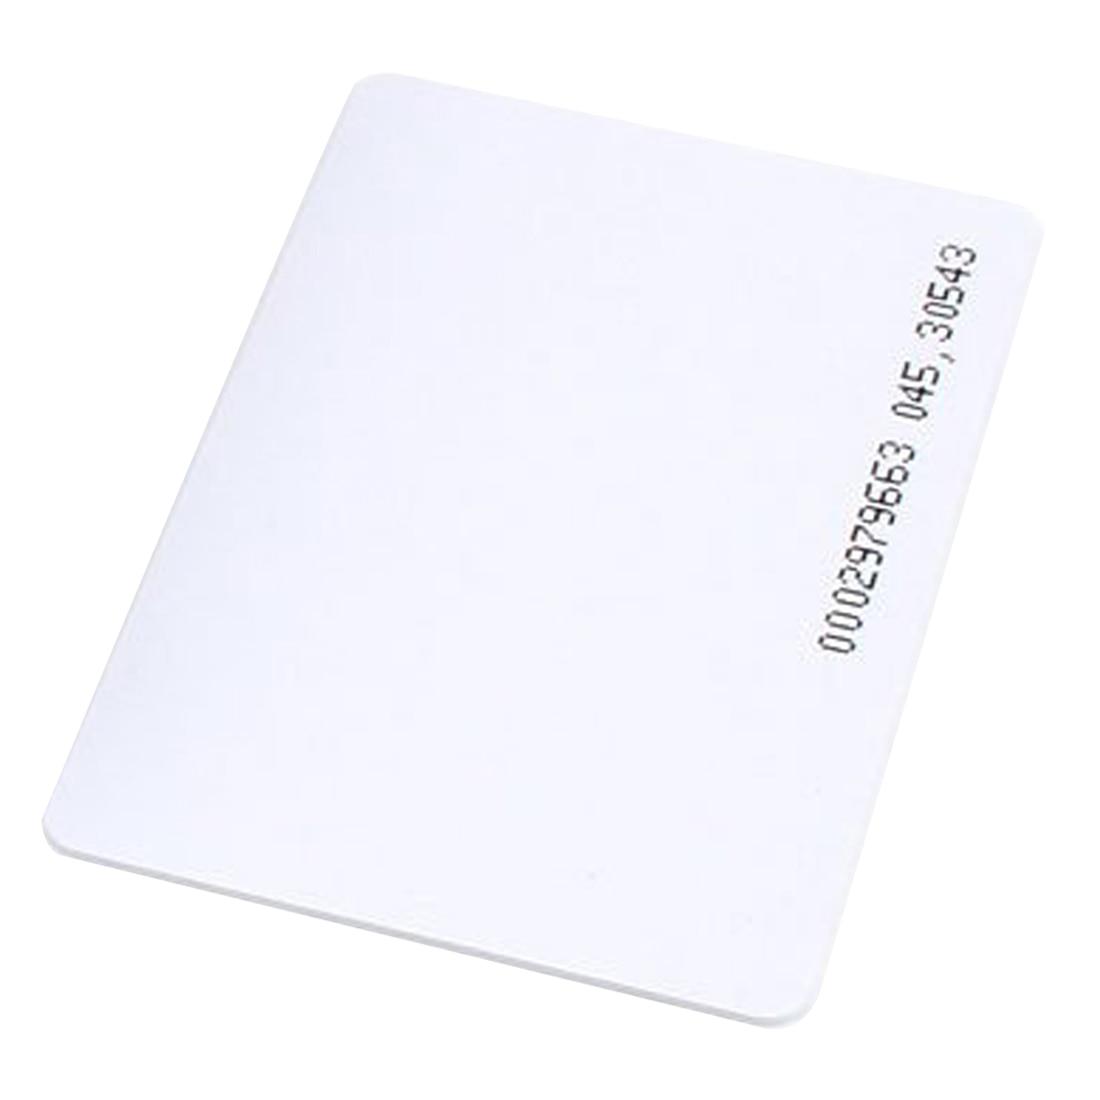 2 Packs 50 pieces Intelligent Proximity EM4100 125kHz RFID Proximity Card Entry Empty ID Access turck proximity switch bi2 g12sk an6x